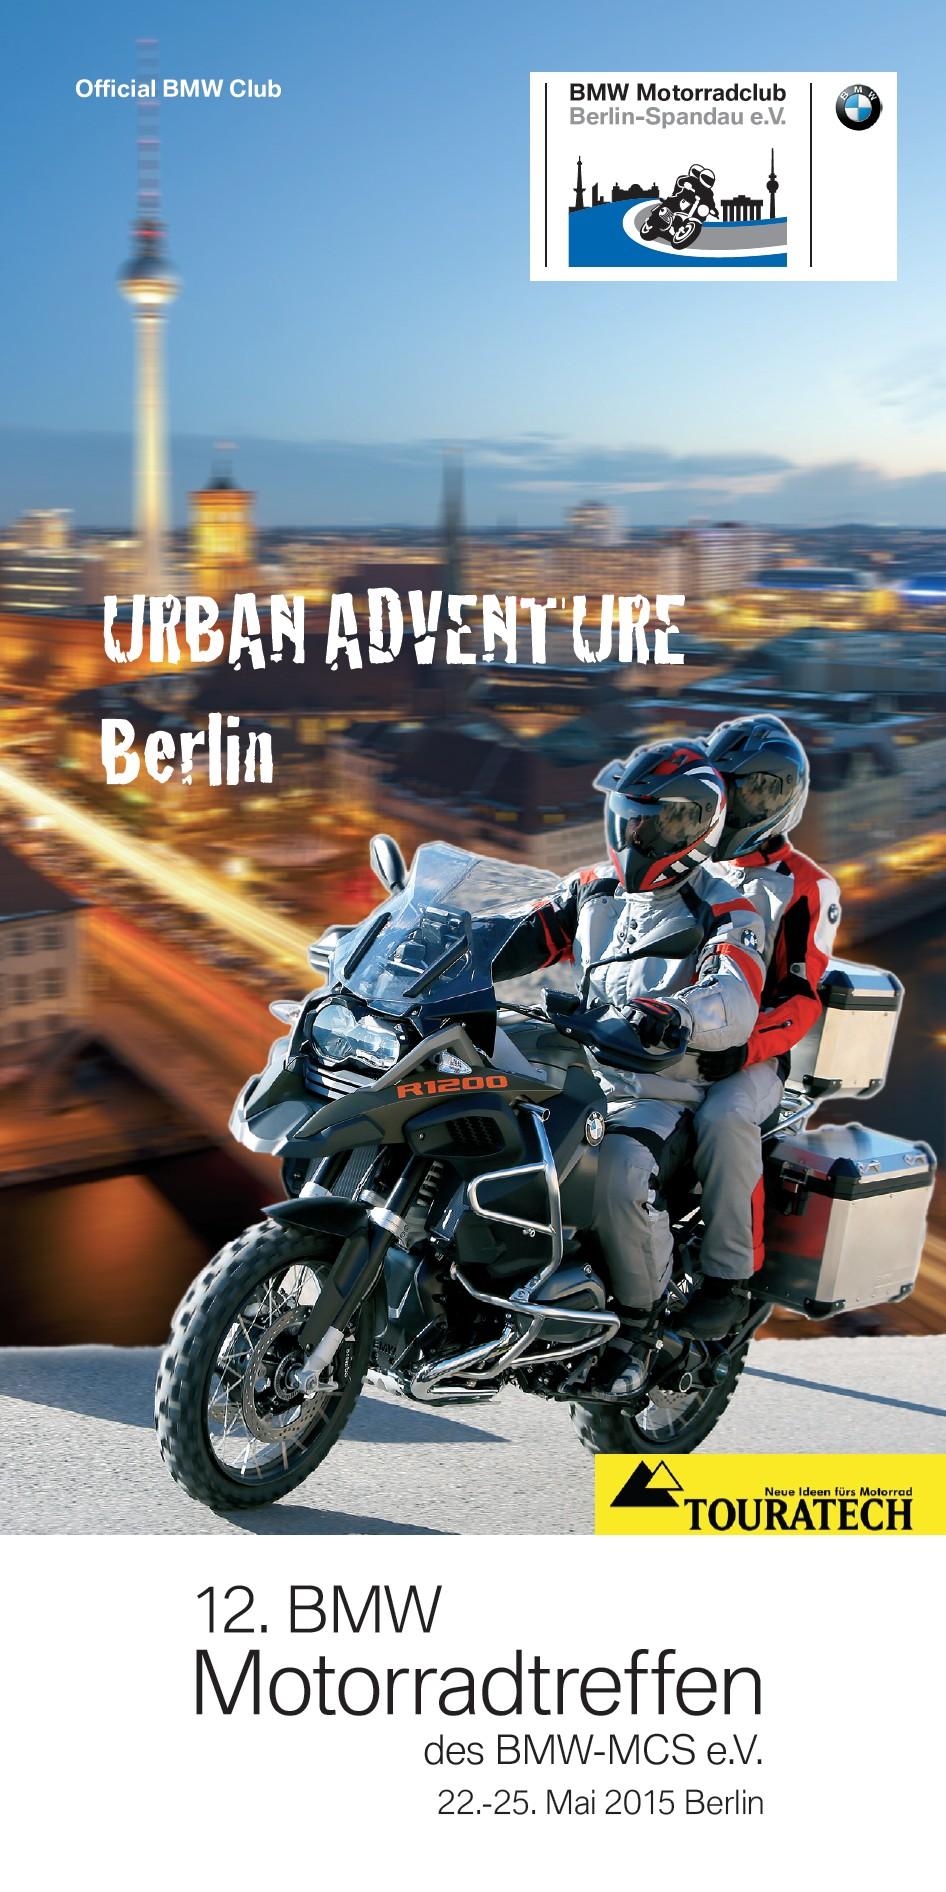 urbanadventures2015_01.jpg